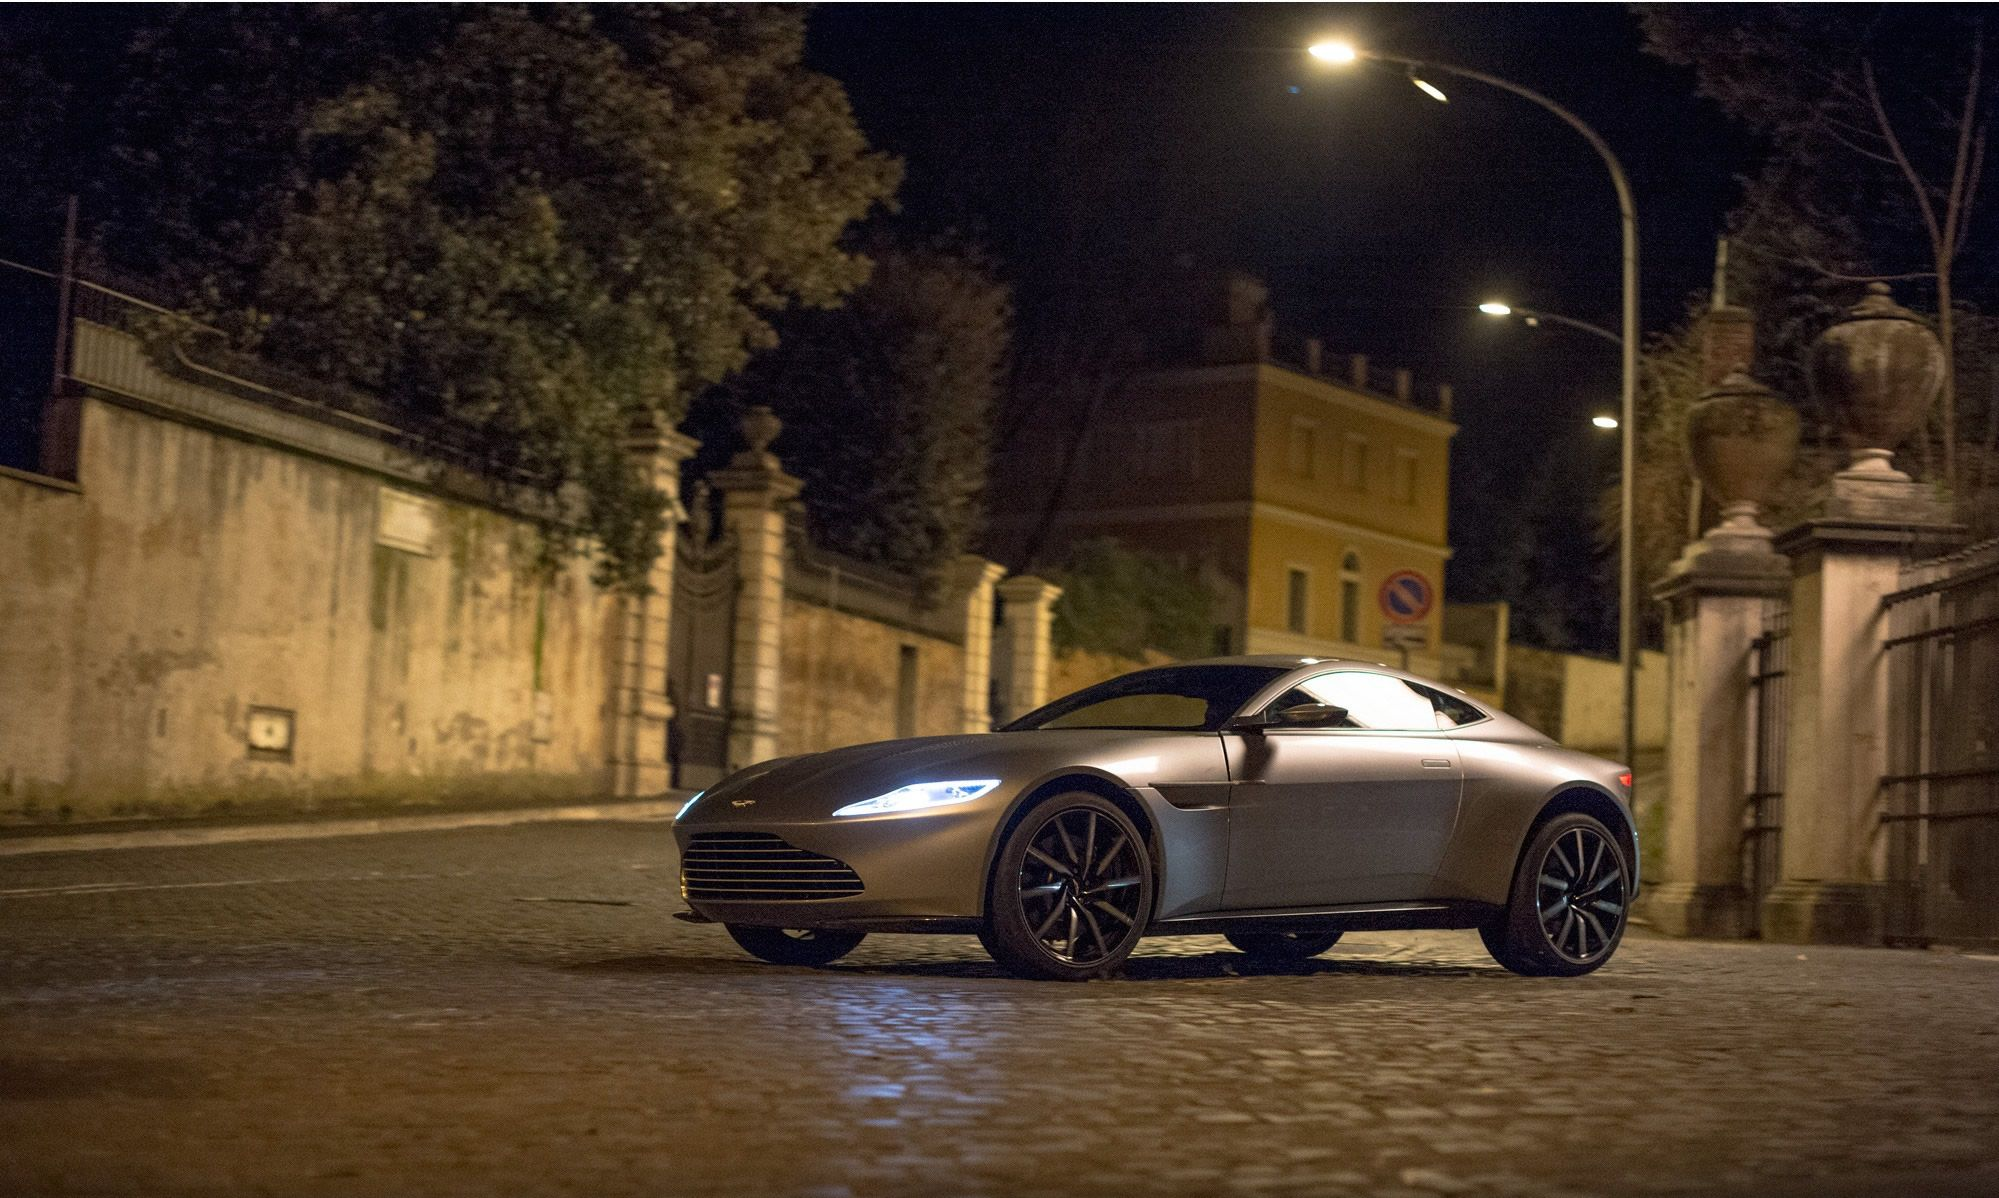 James Bonds Aston Martin DB That Was Used In The Latest Bond - Aston martin price used